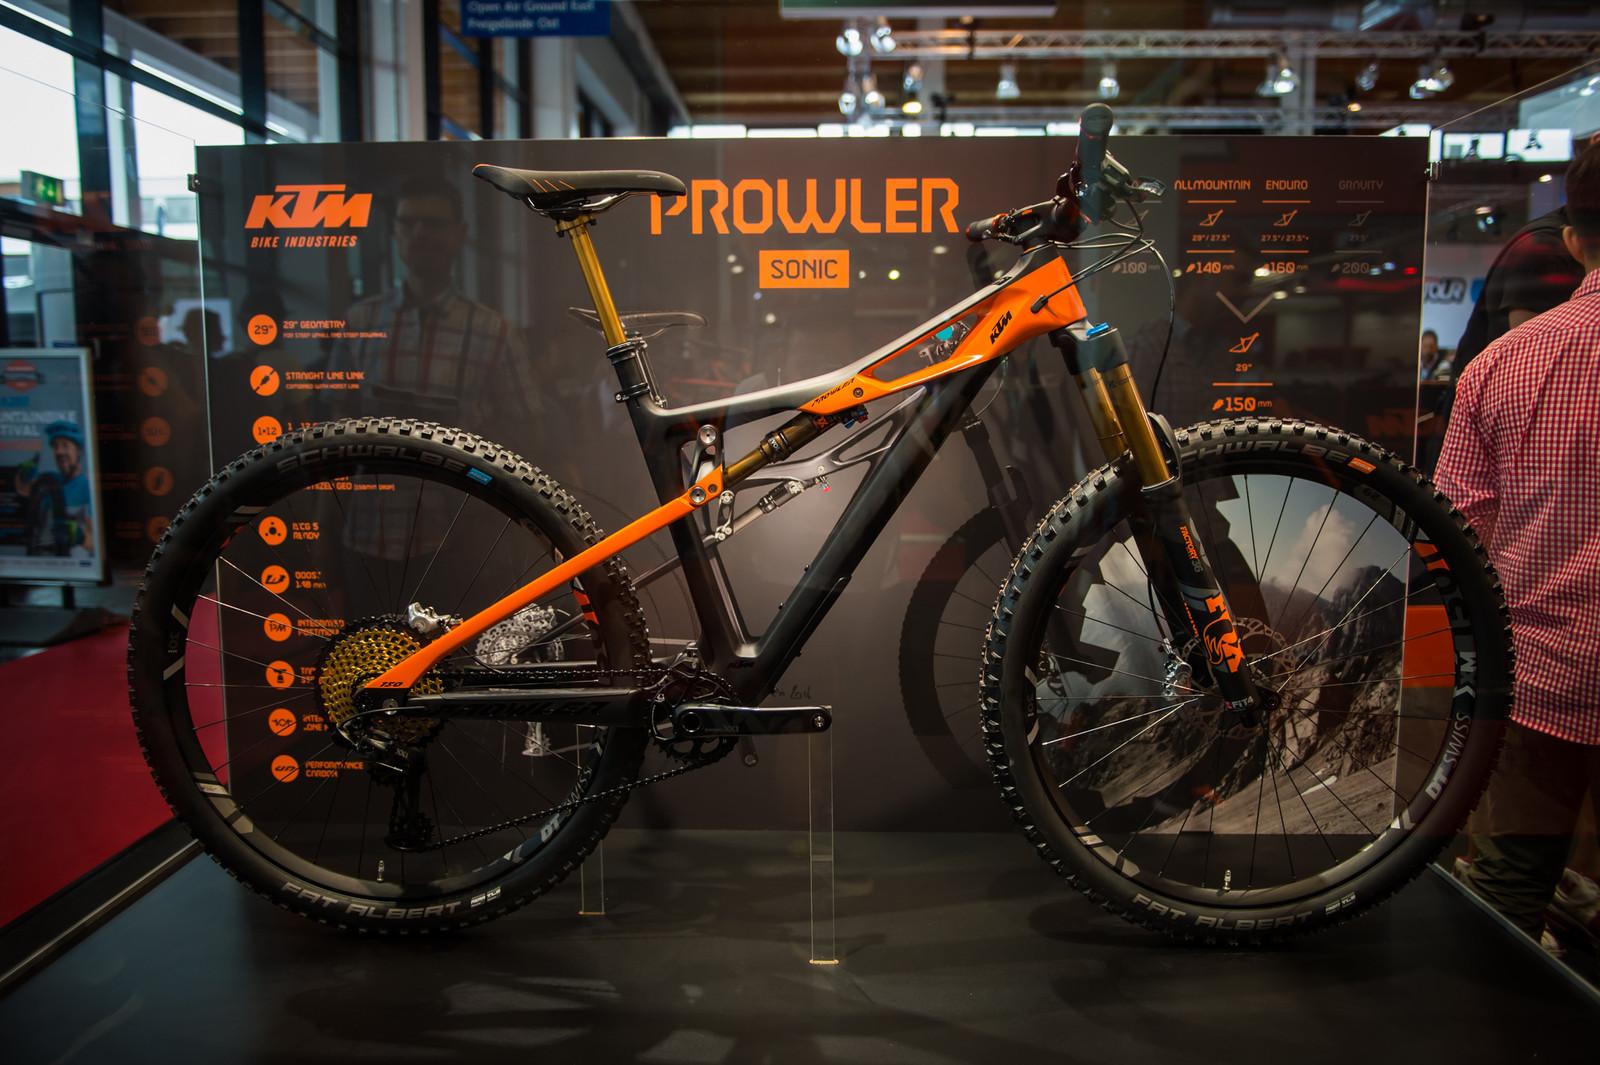 KTM Prowler 150mm-Travel 29er Bike